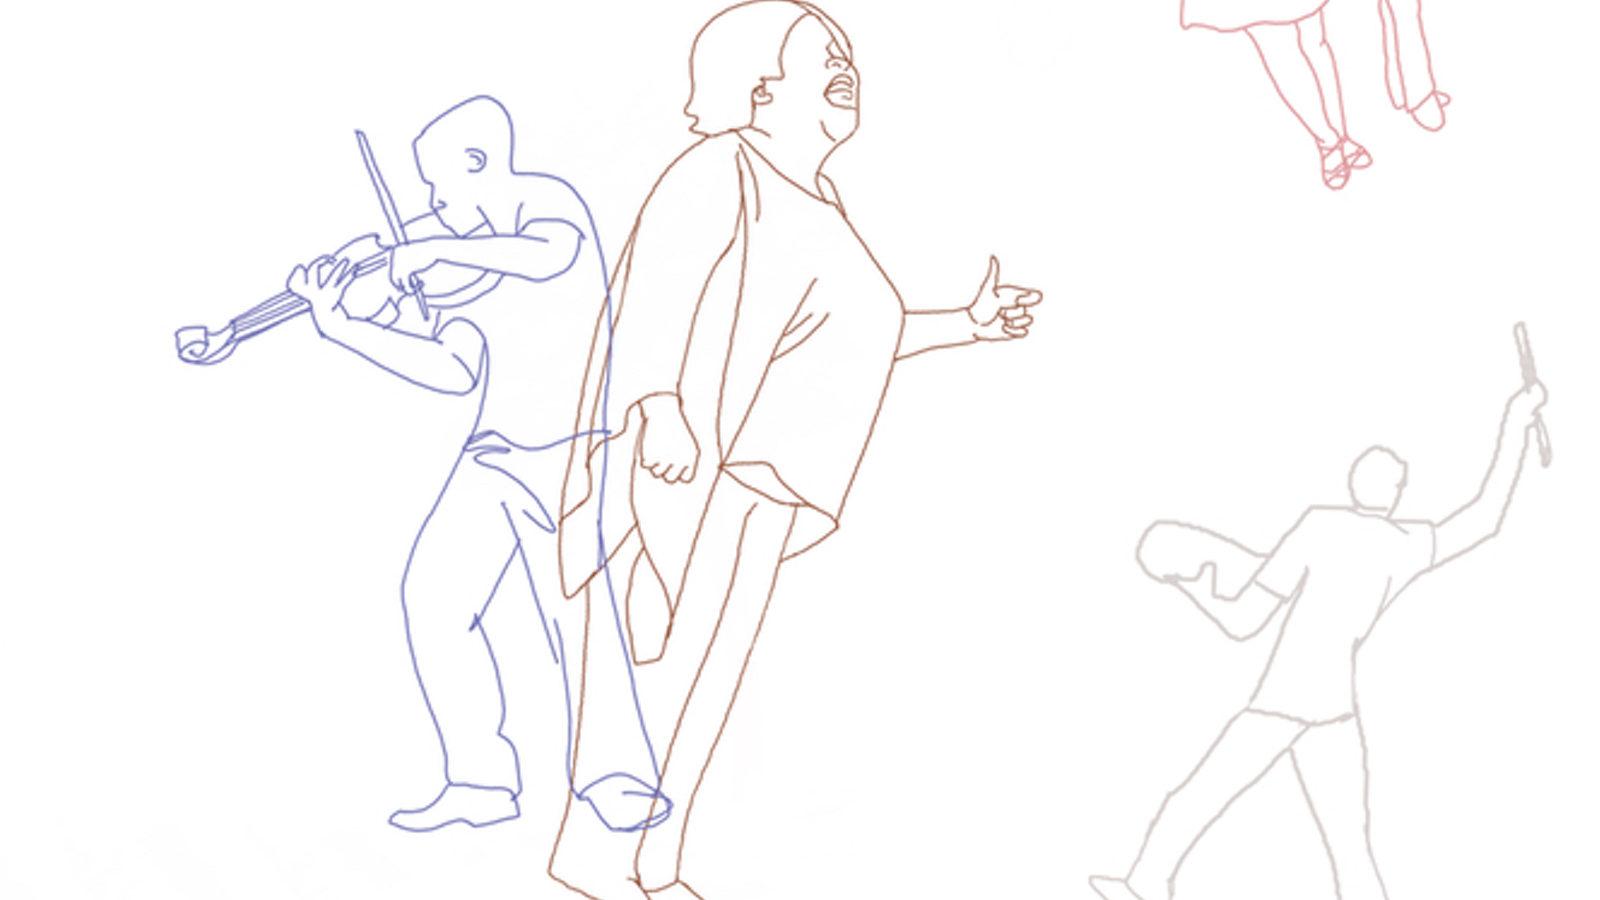 Worship illustration by Denise Klitsie